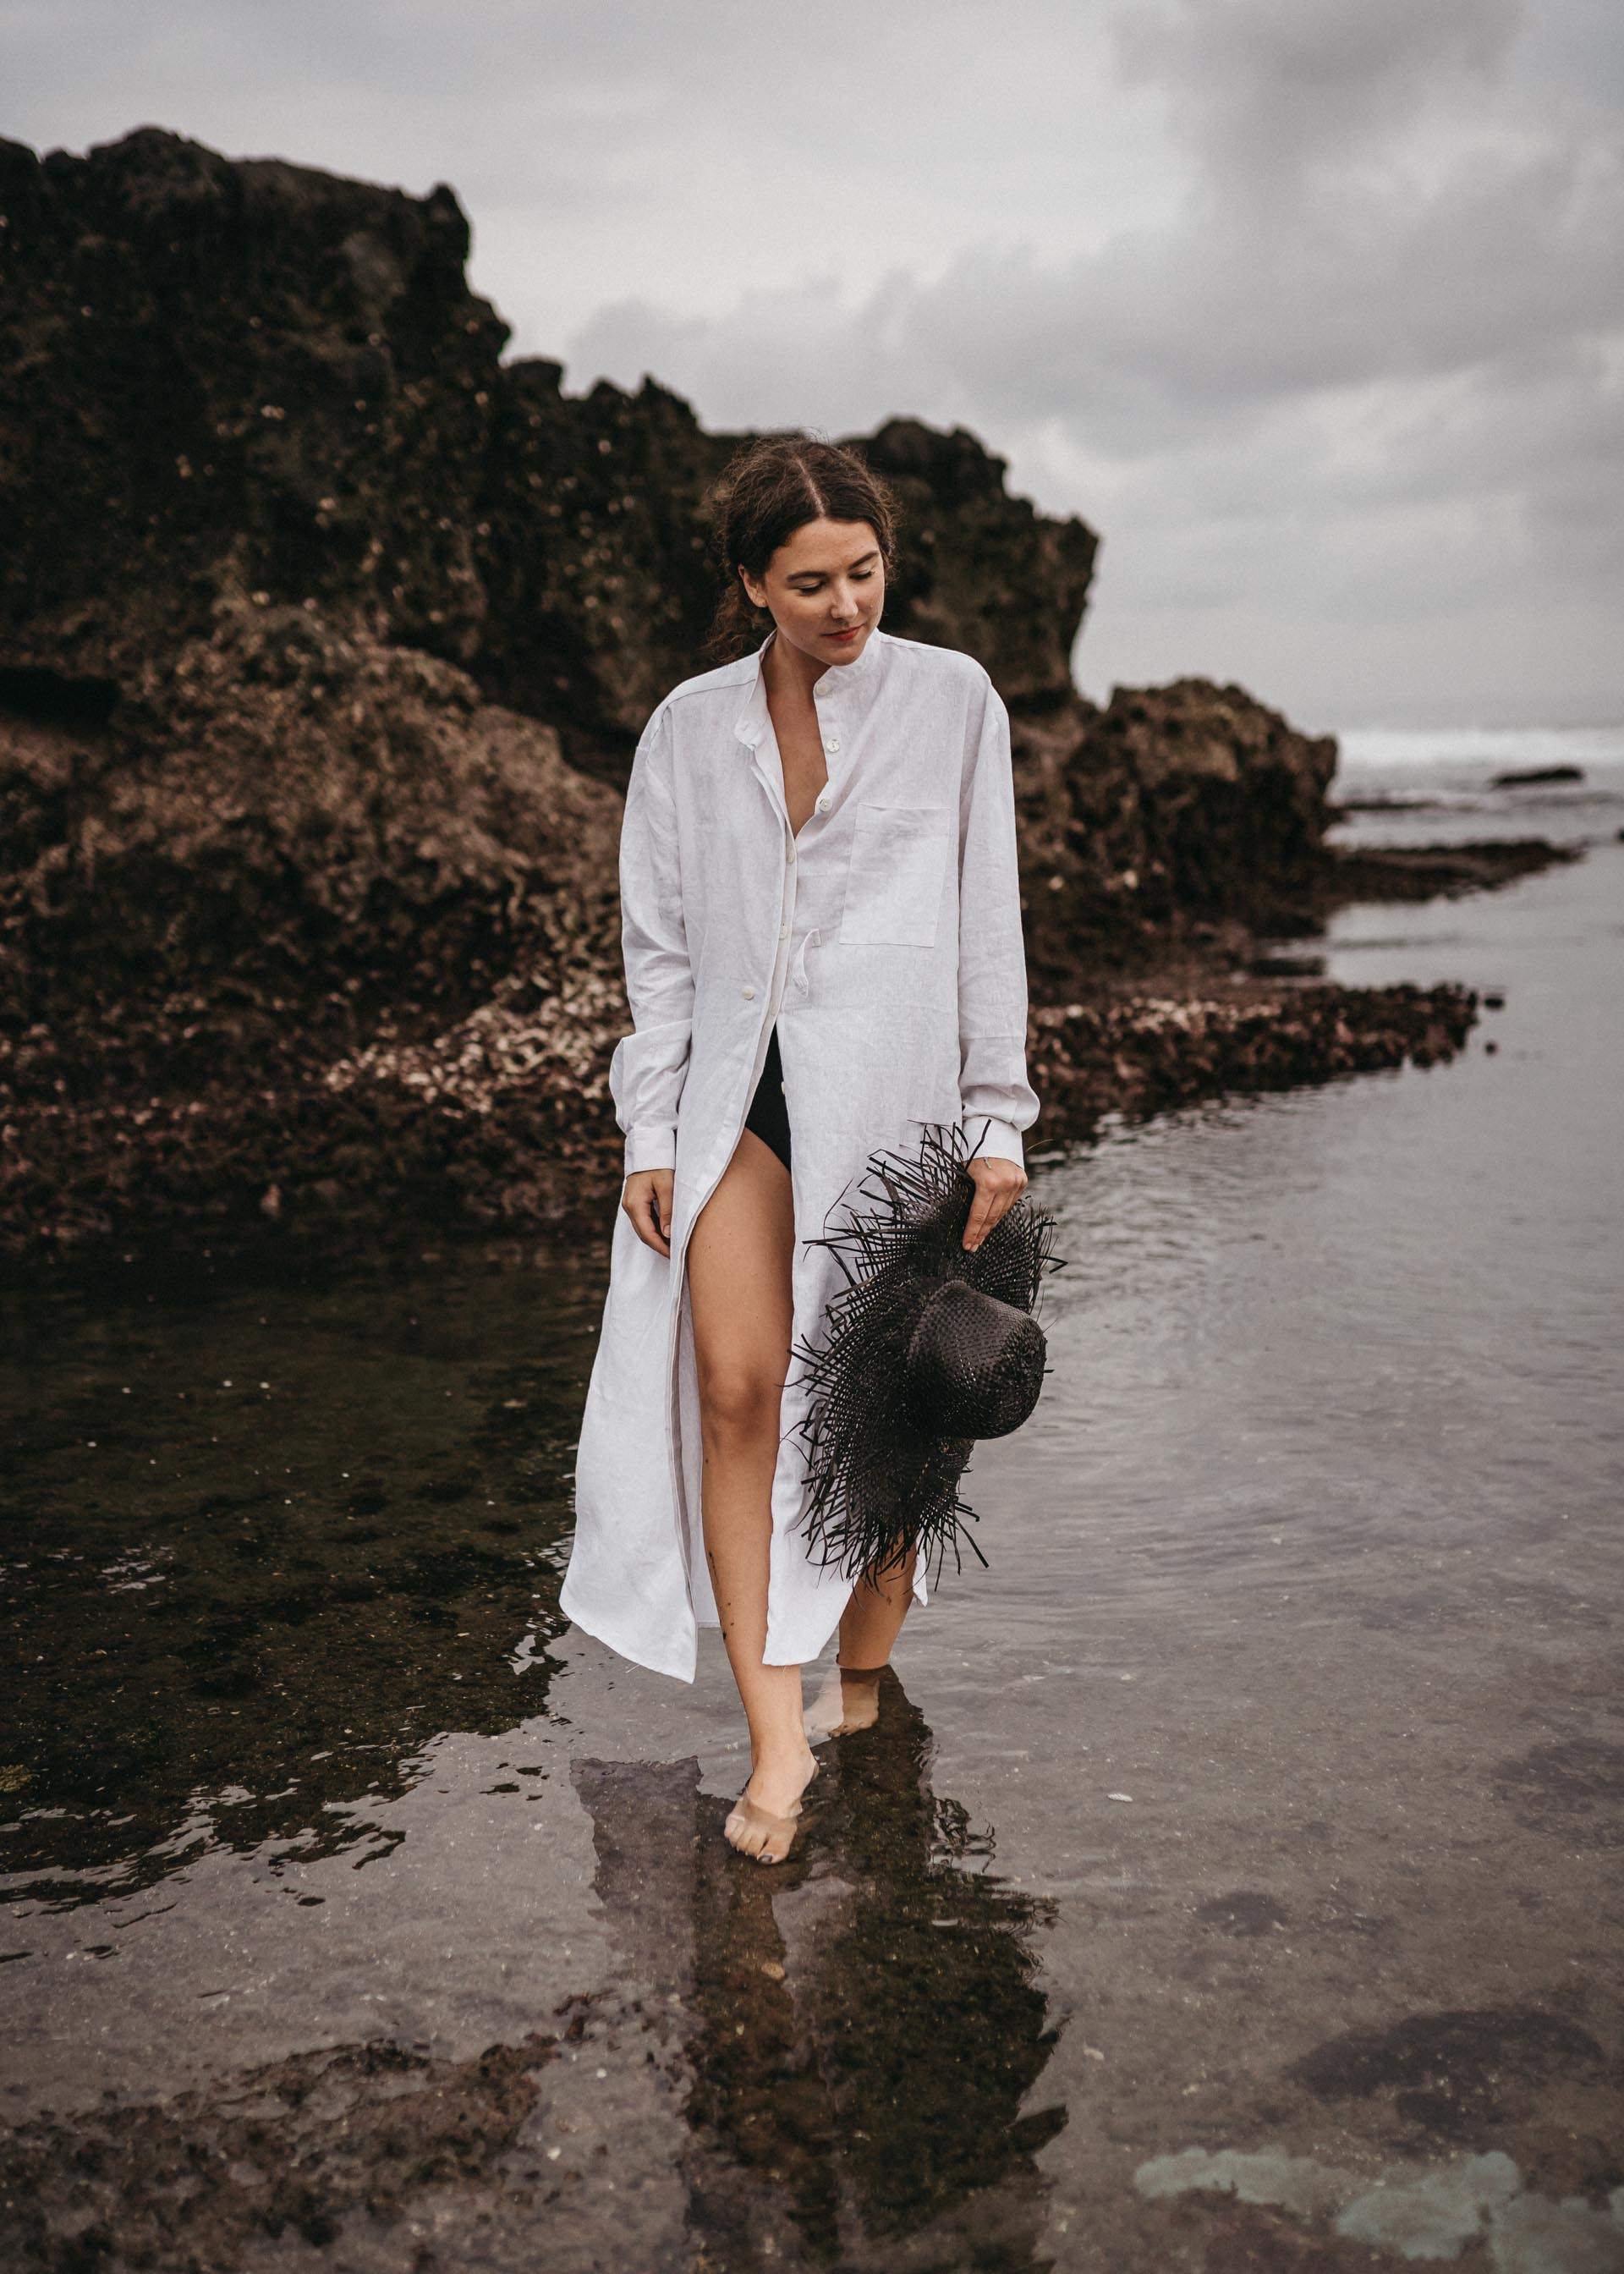 keira-mason-studio-karma-beach-white-dress-water.jpg